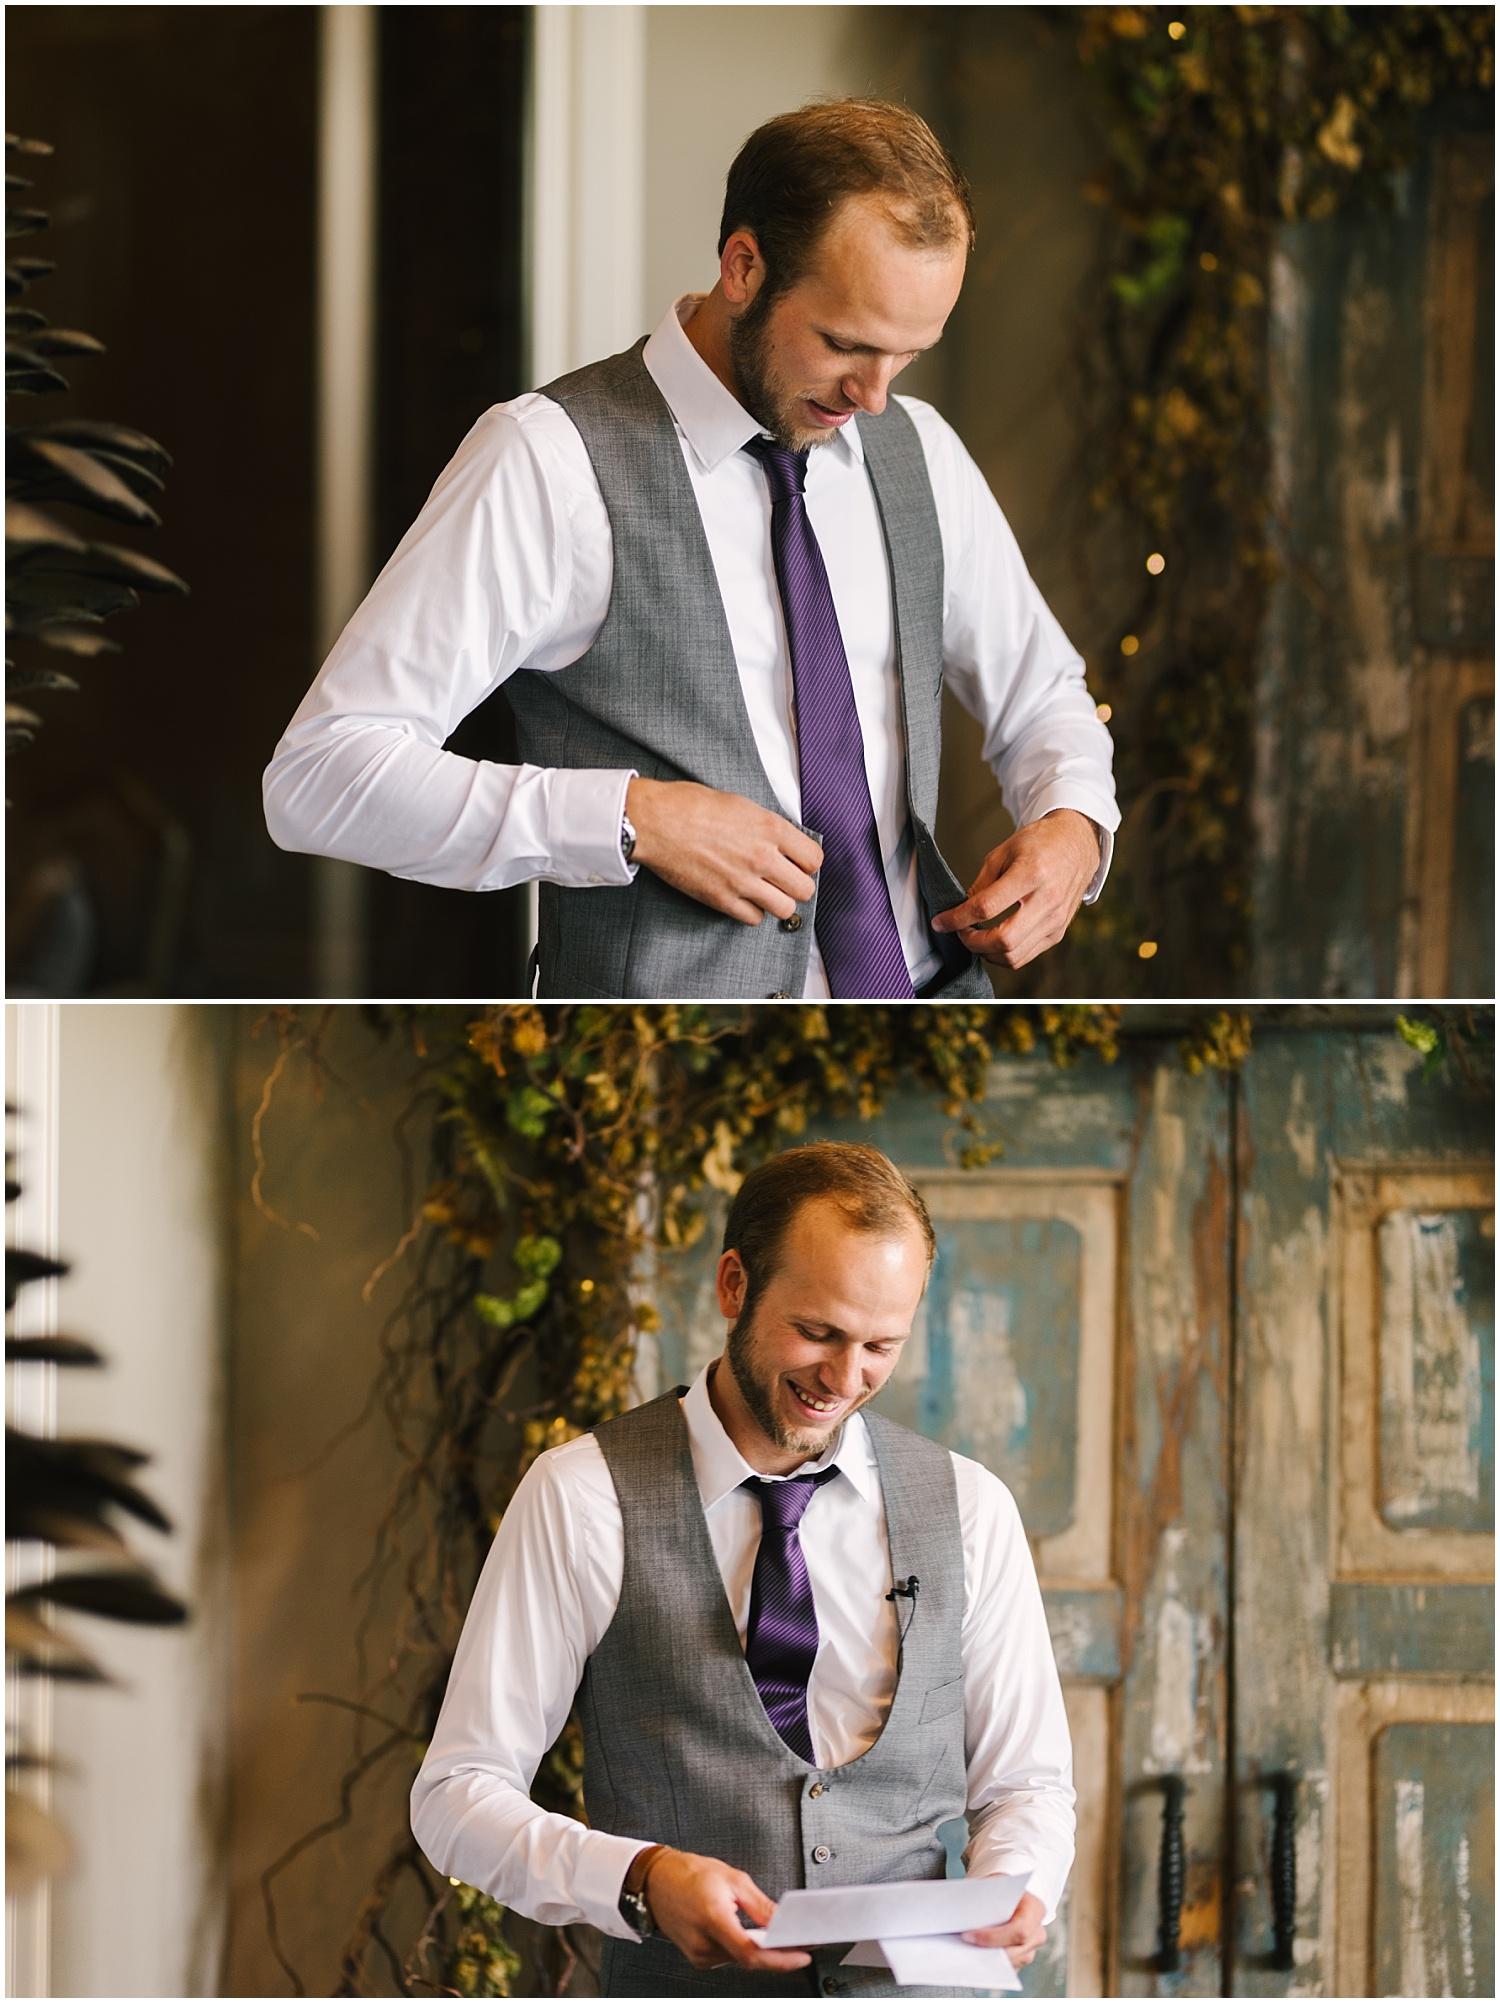 deerfield+country+club+wedding+rochester+NY+photographer (10).jpg